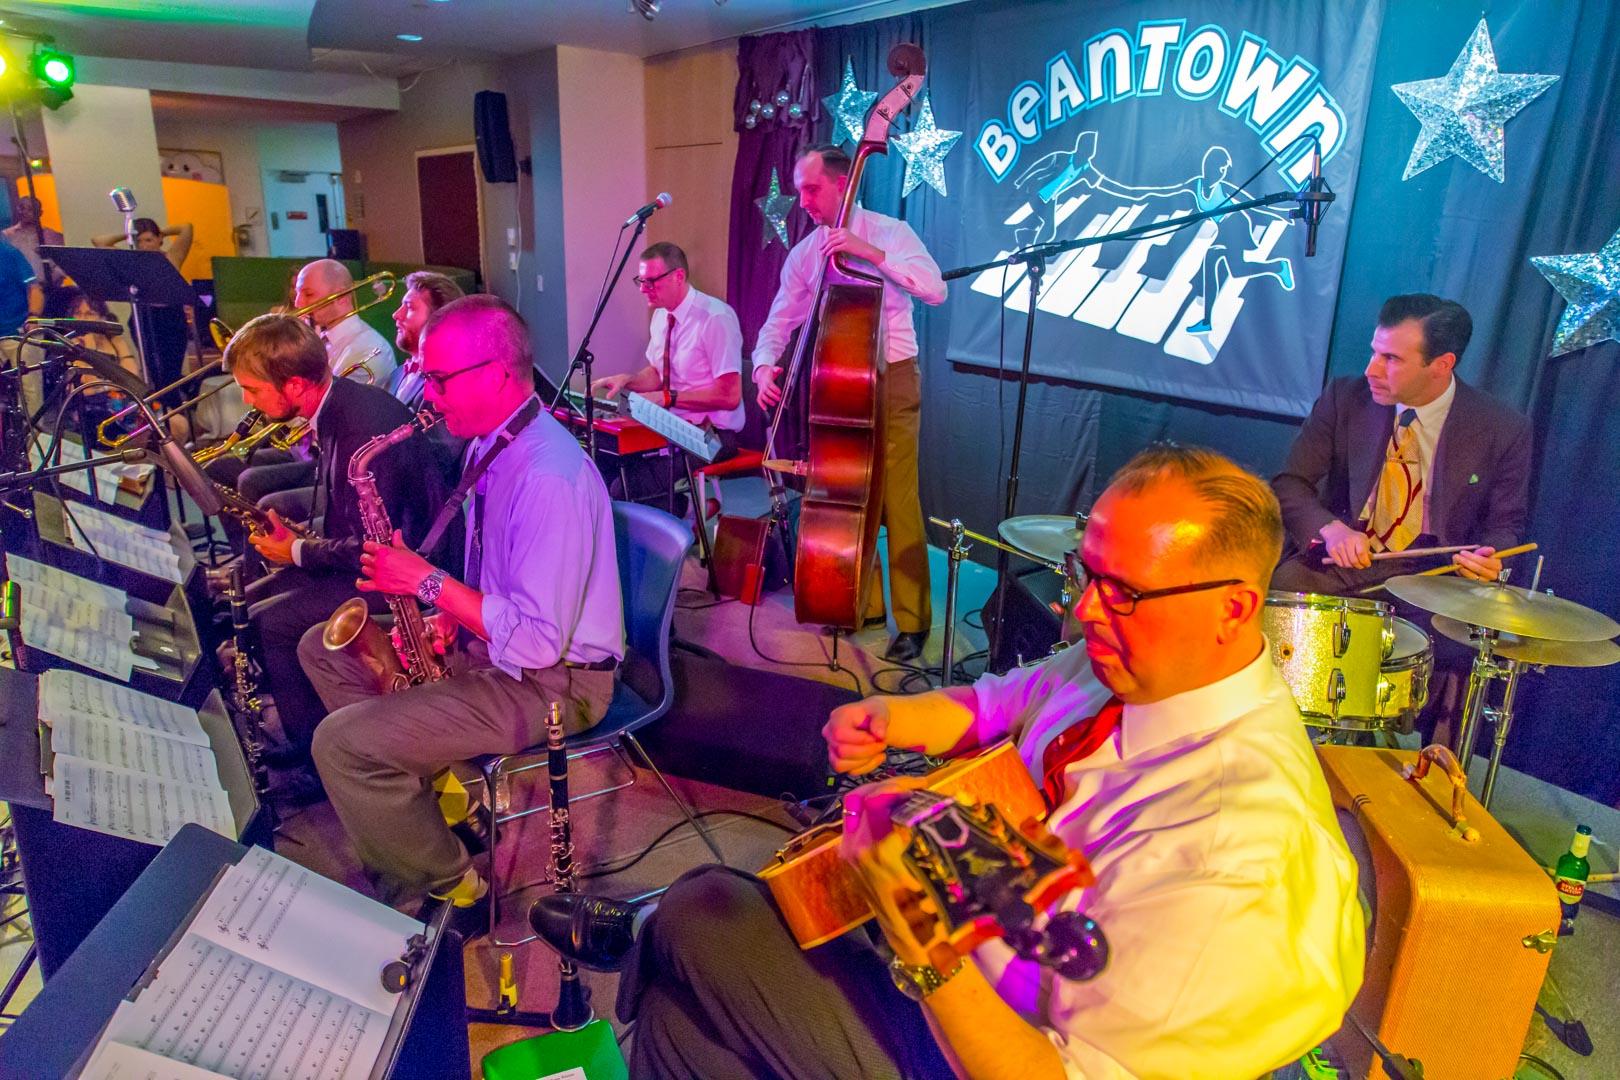 Michael Gamble and the Rhythm Serenaders